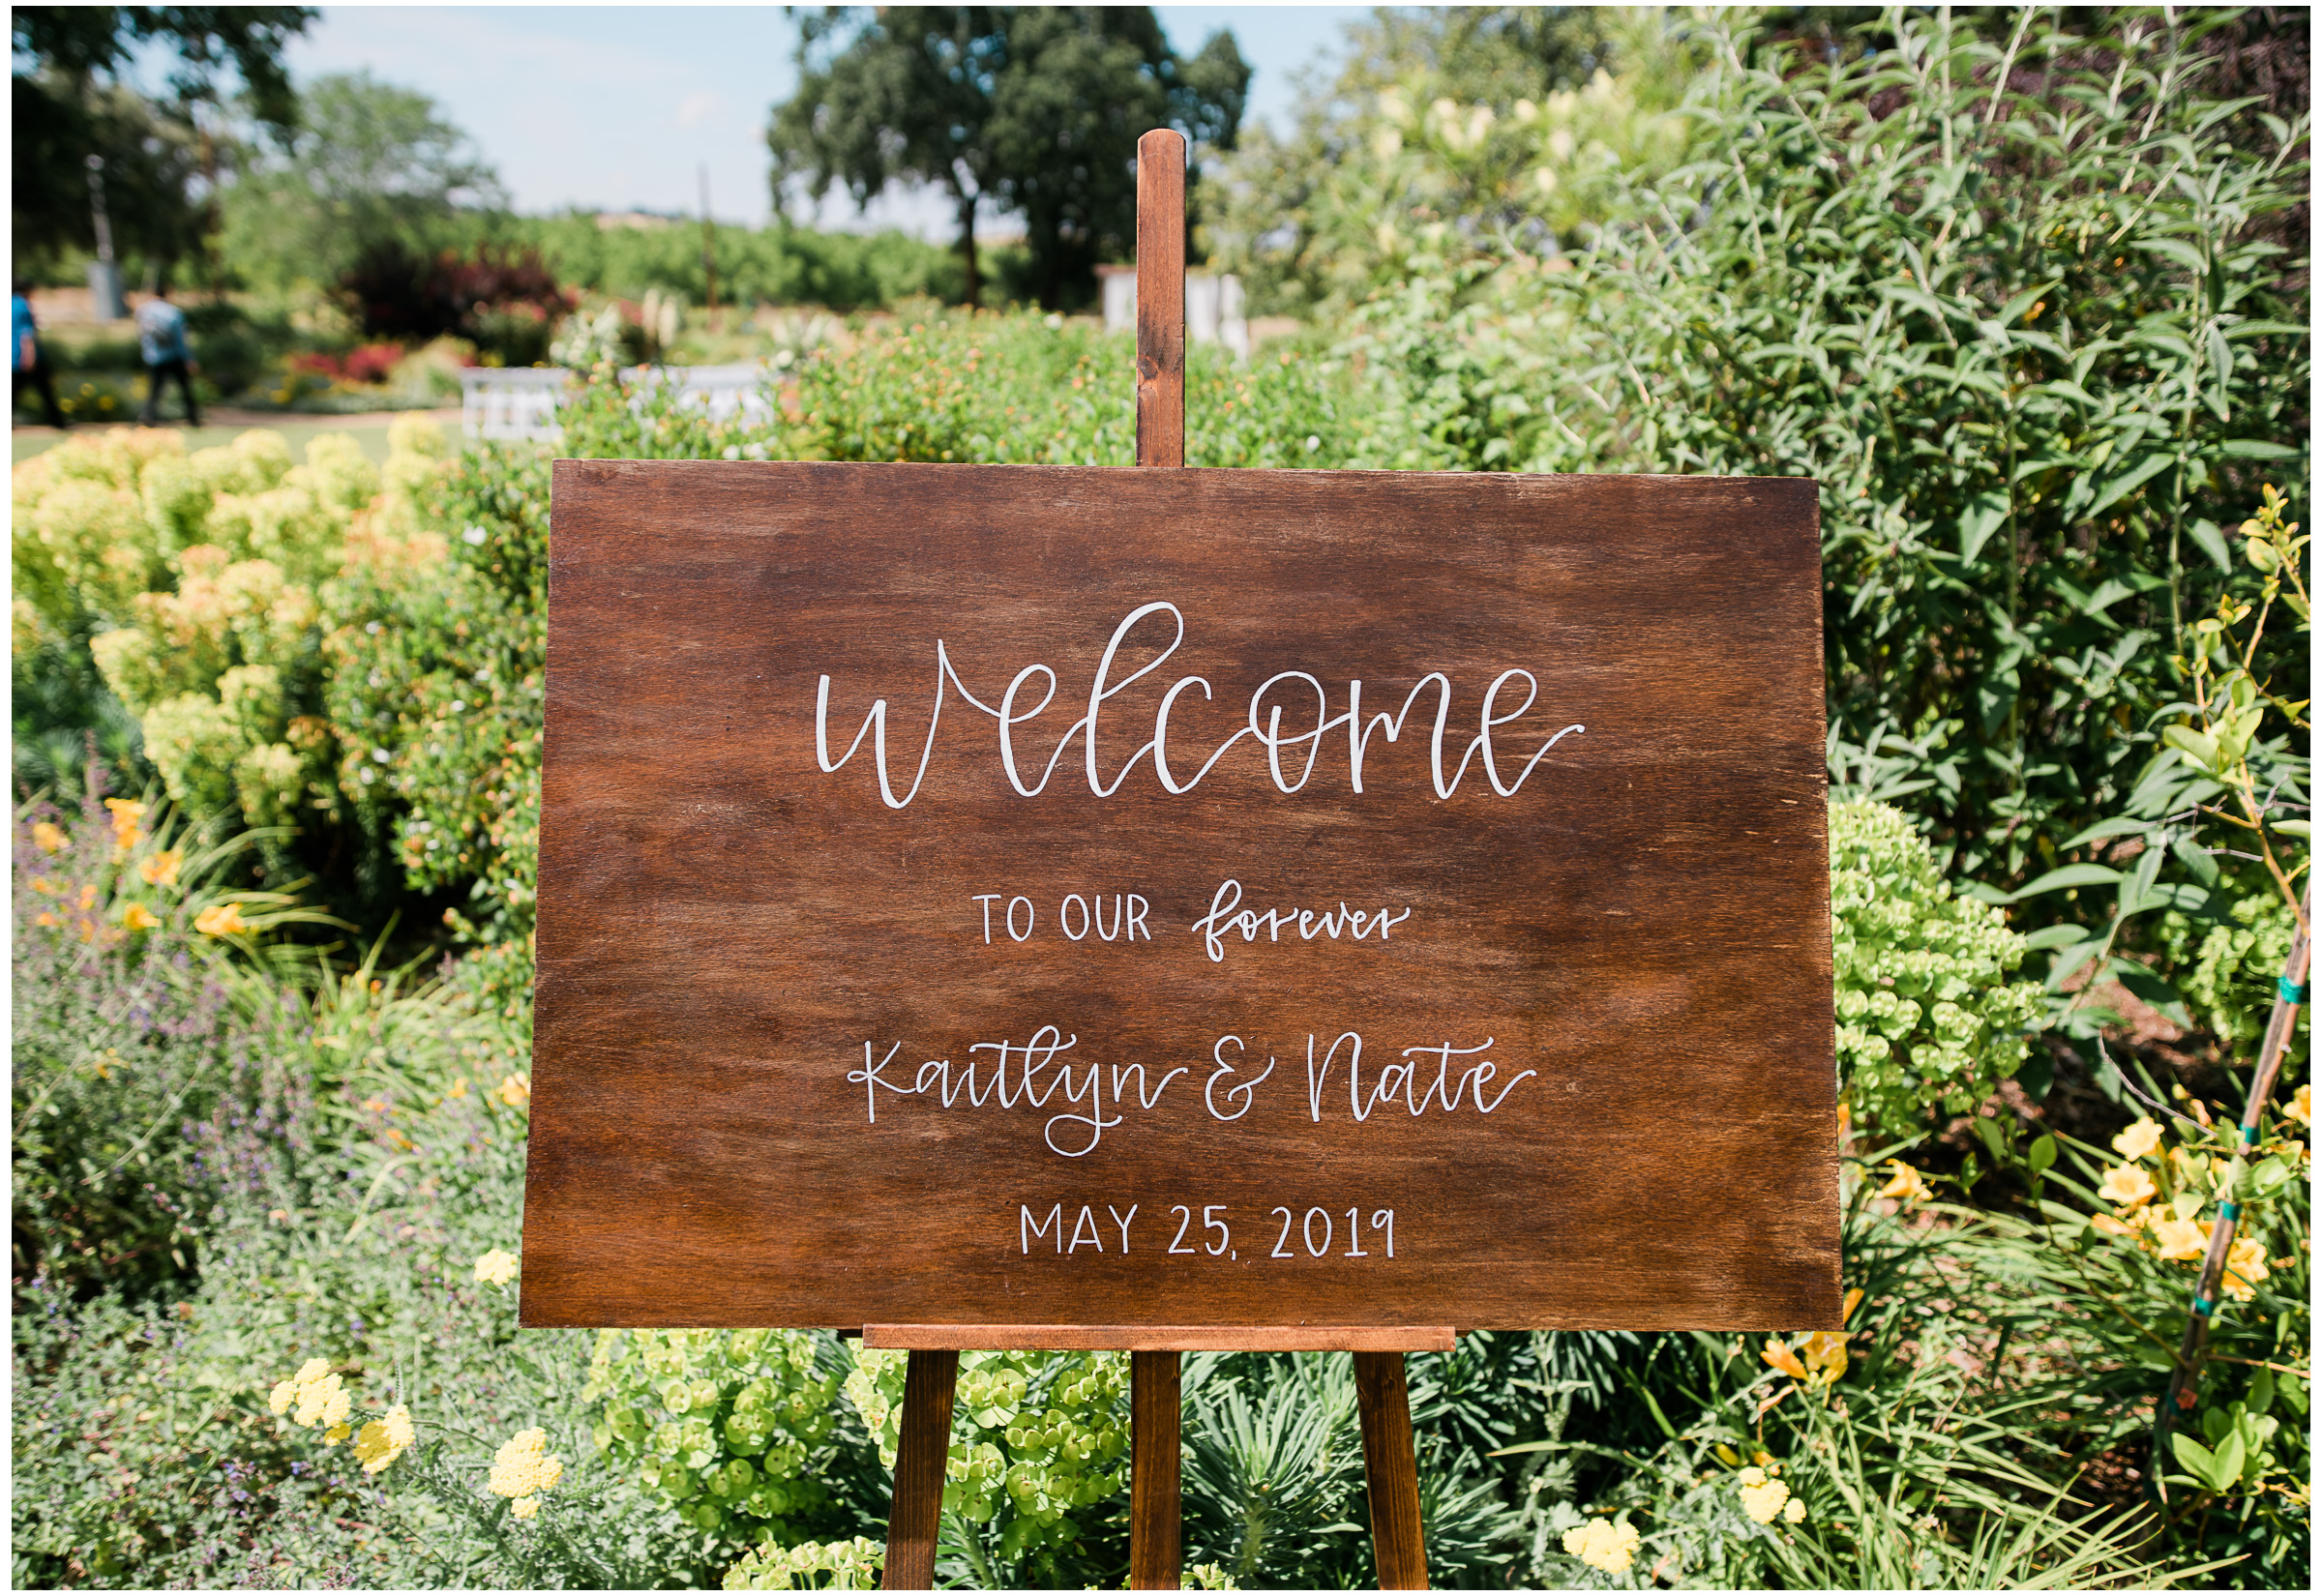 Winters Wedding - Sacramento Photographer - Field & Pond - Justin Wilcox Photography - 16.jpg